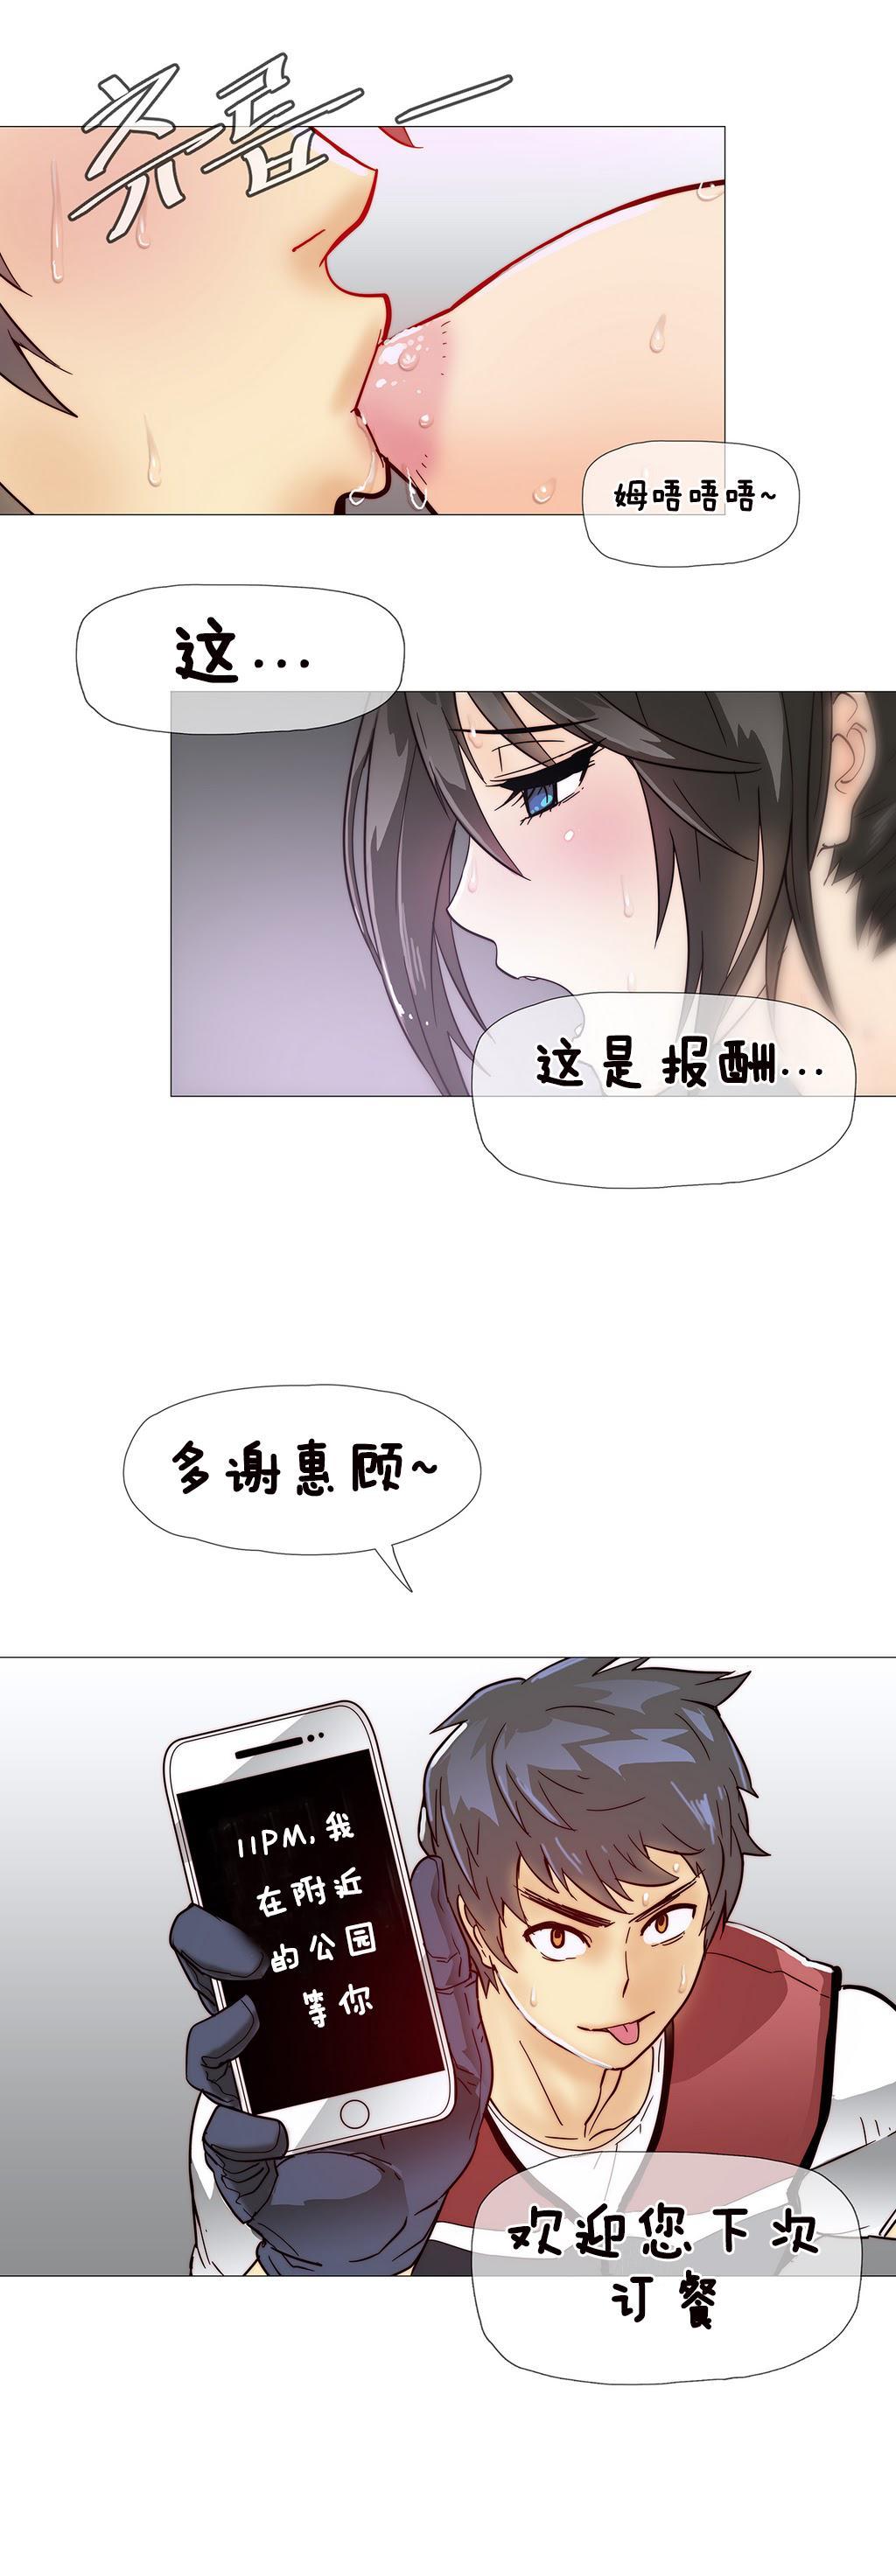 HouseHold Affairs 【卞赤鲤个人汉化】1~21话(持续更新中) 159